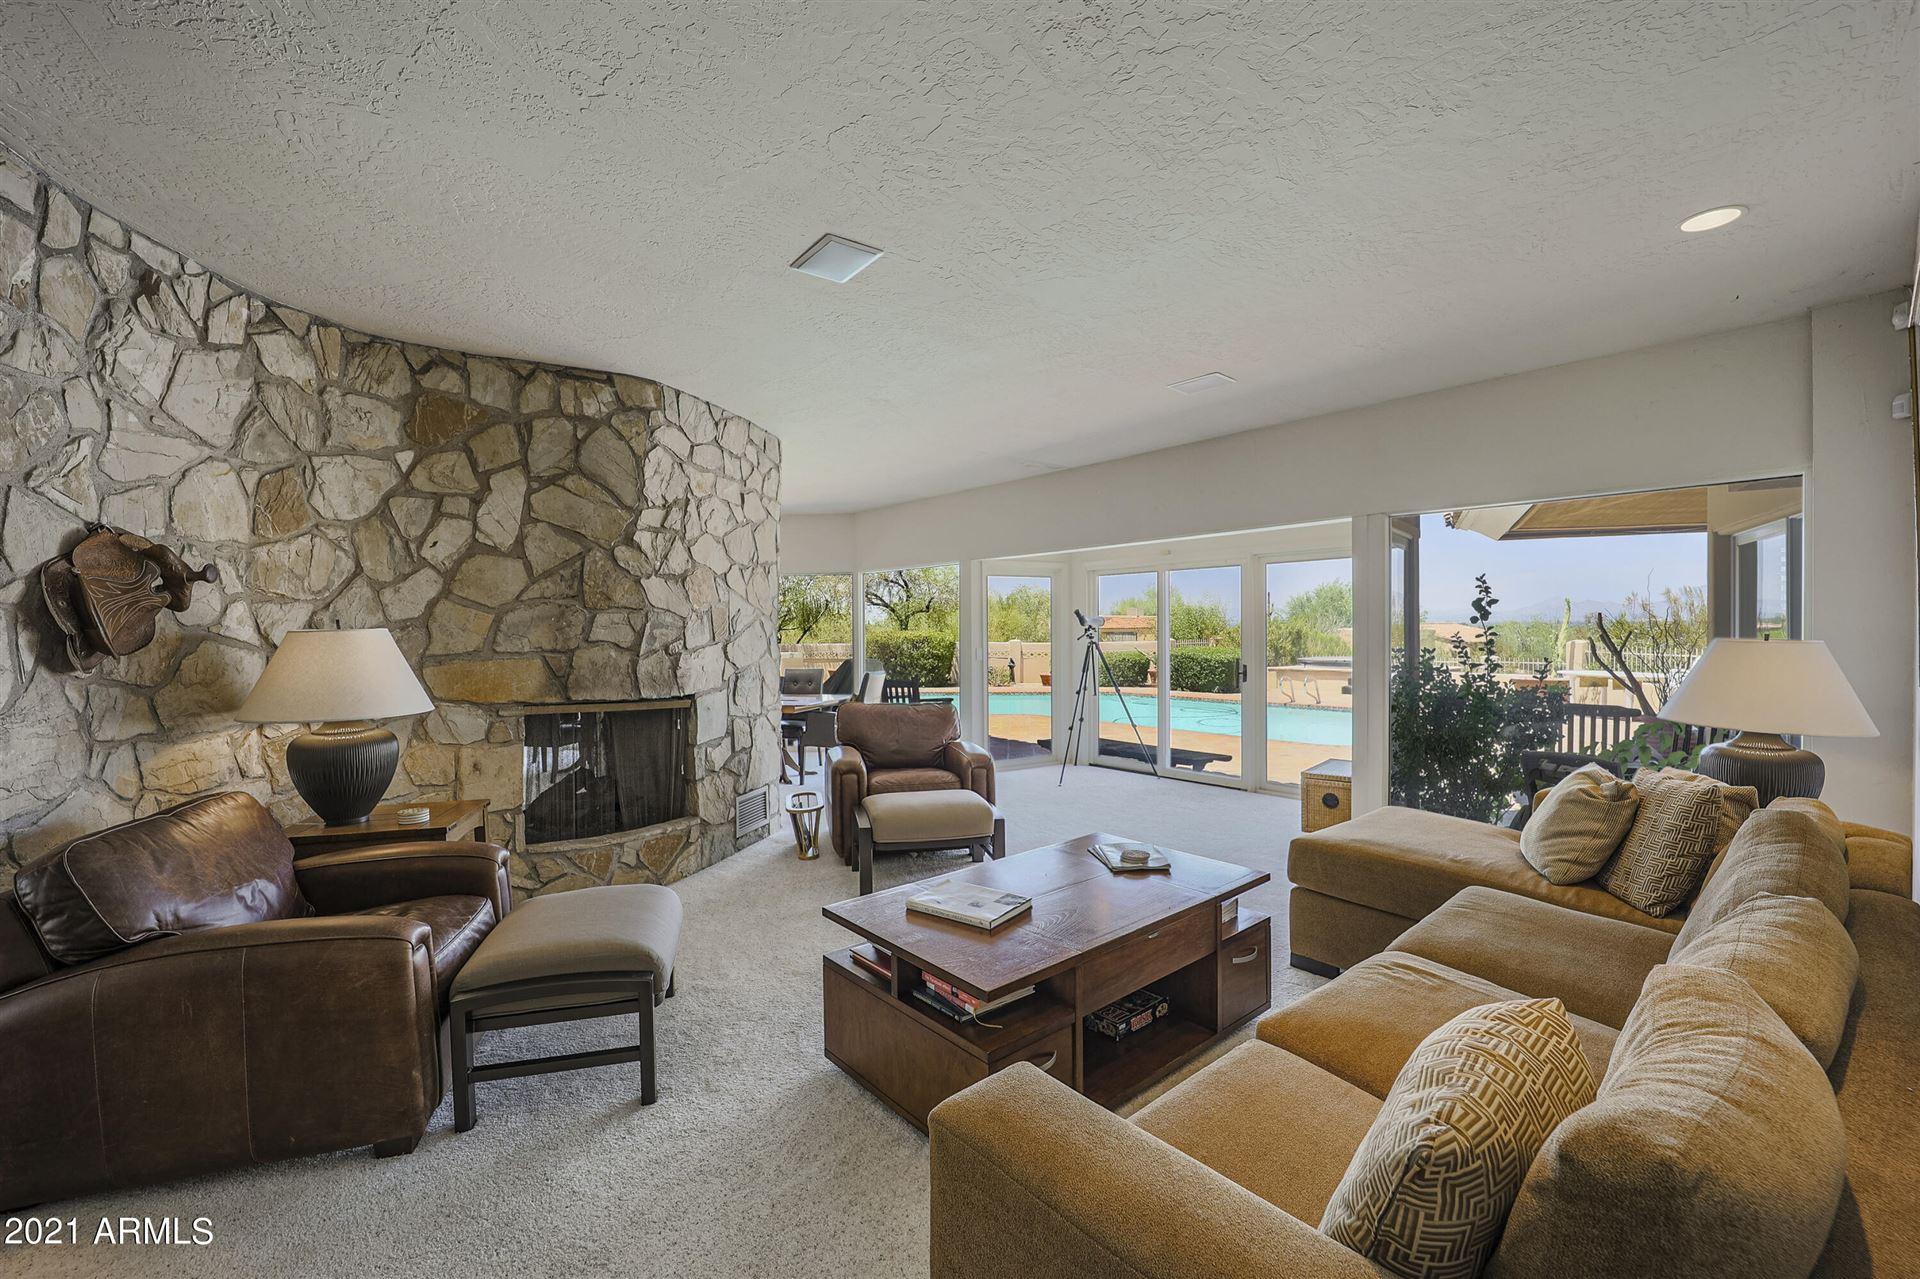 Photo of 6220 E Cholla Drive, Paradise Valley, AZ 85253 (MLS # 6263927)